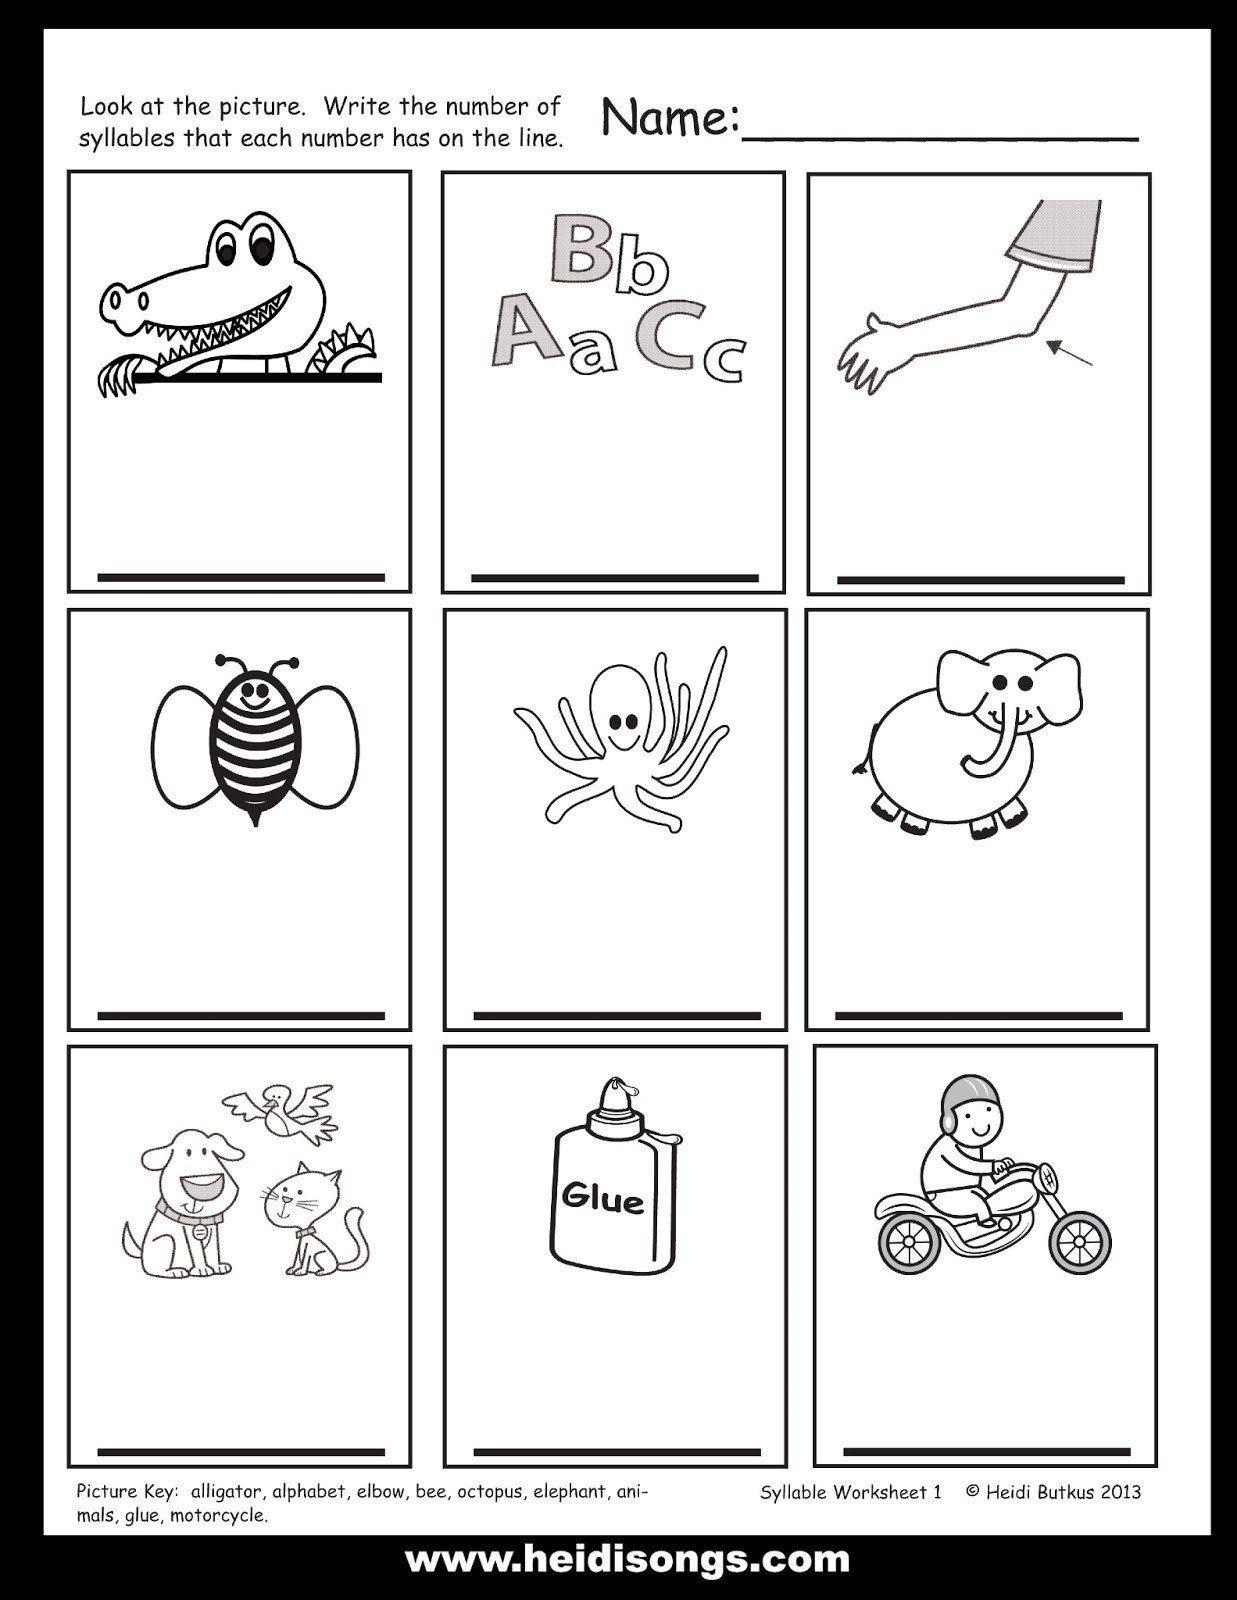 Syllables Worksheet For Kindergarten Copy Syllables